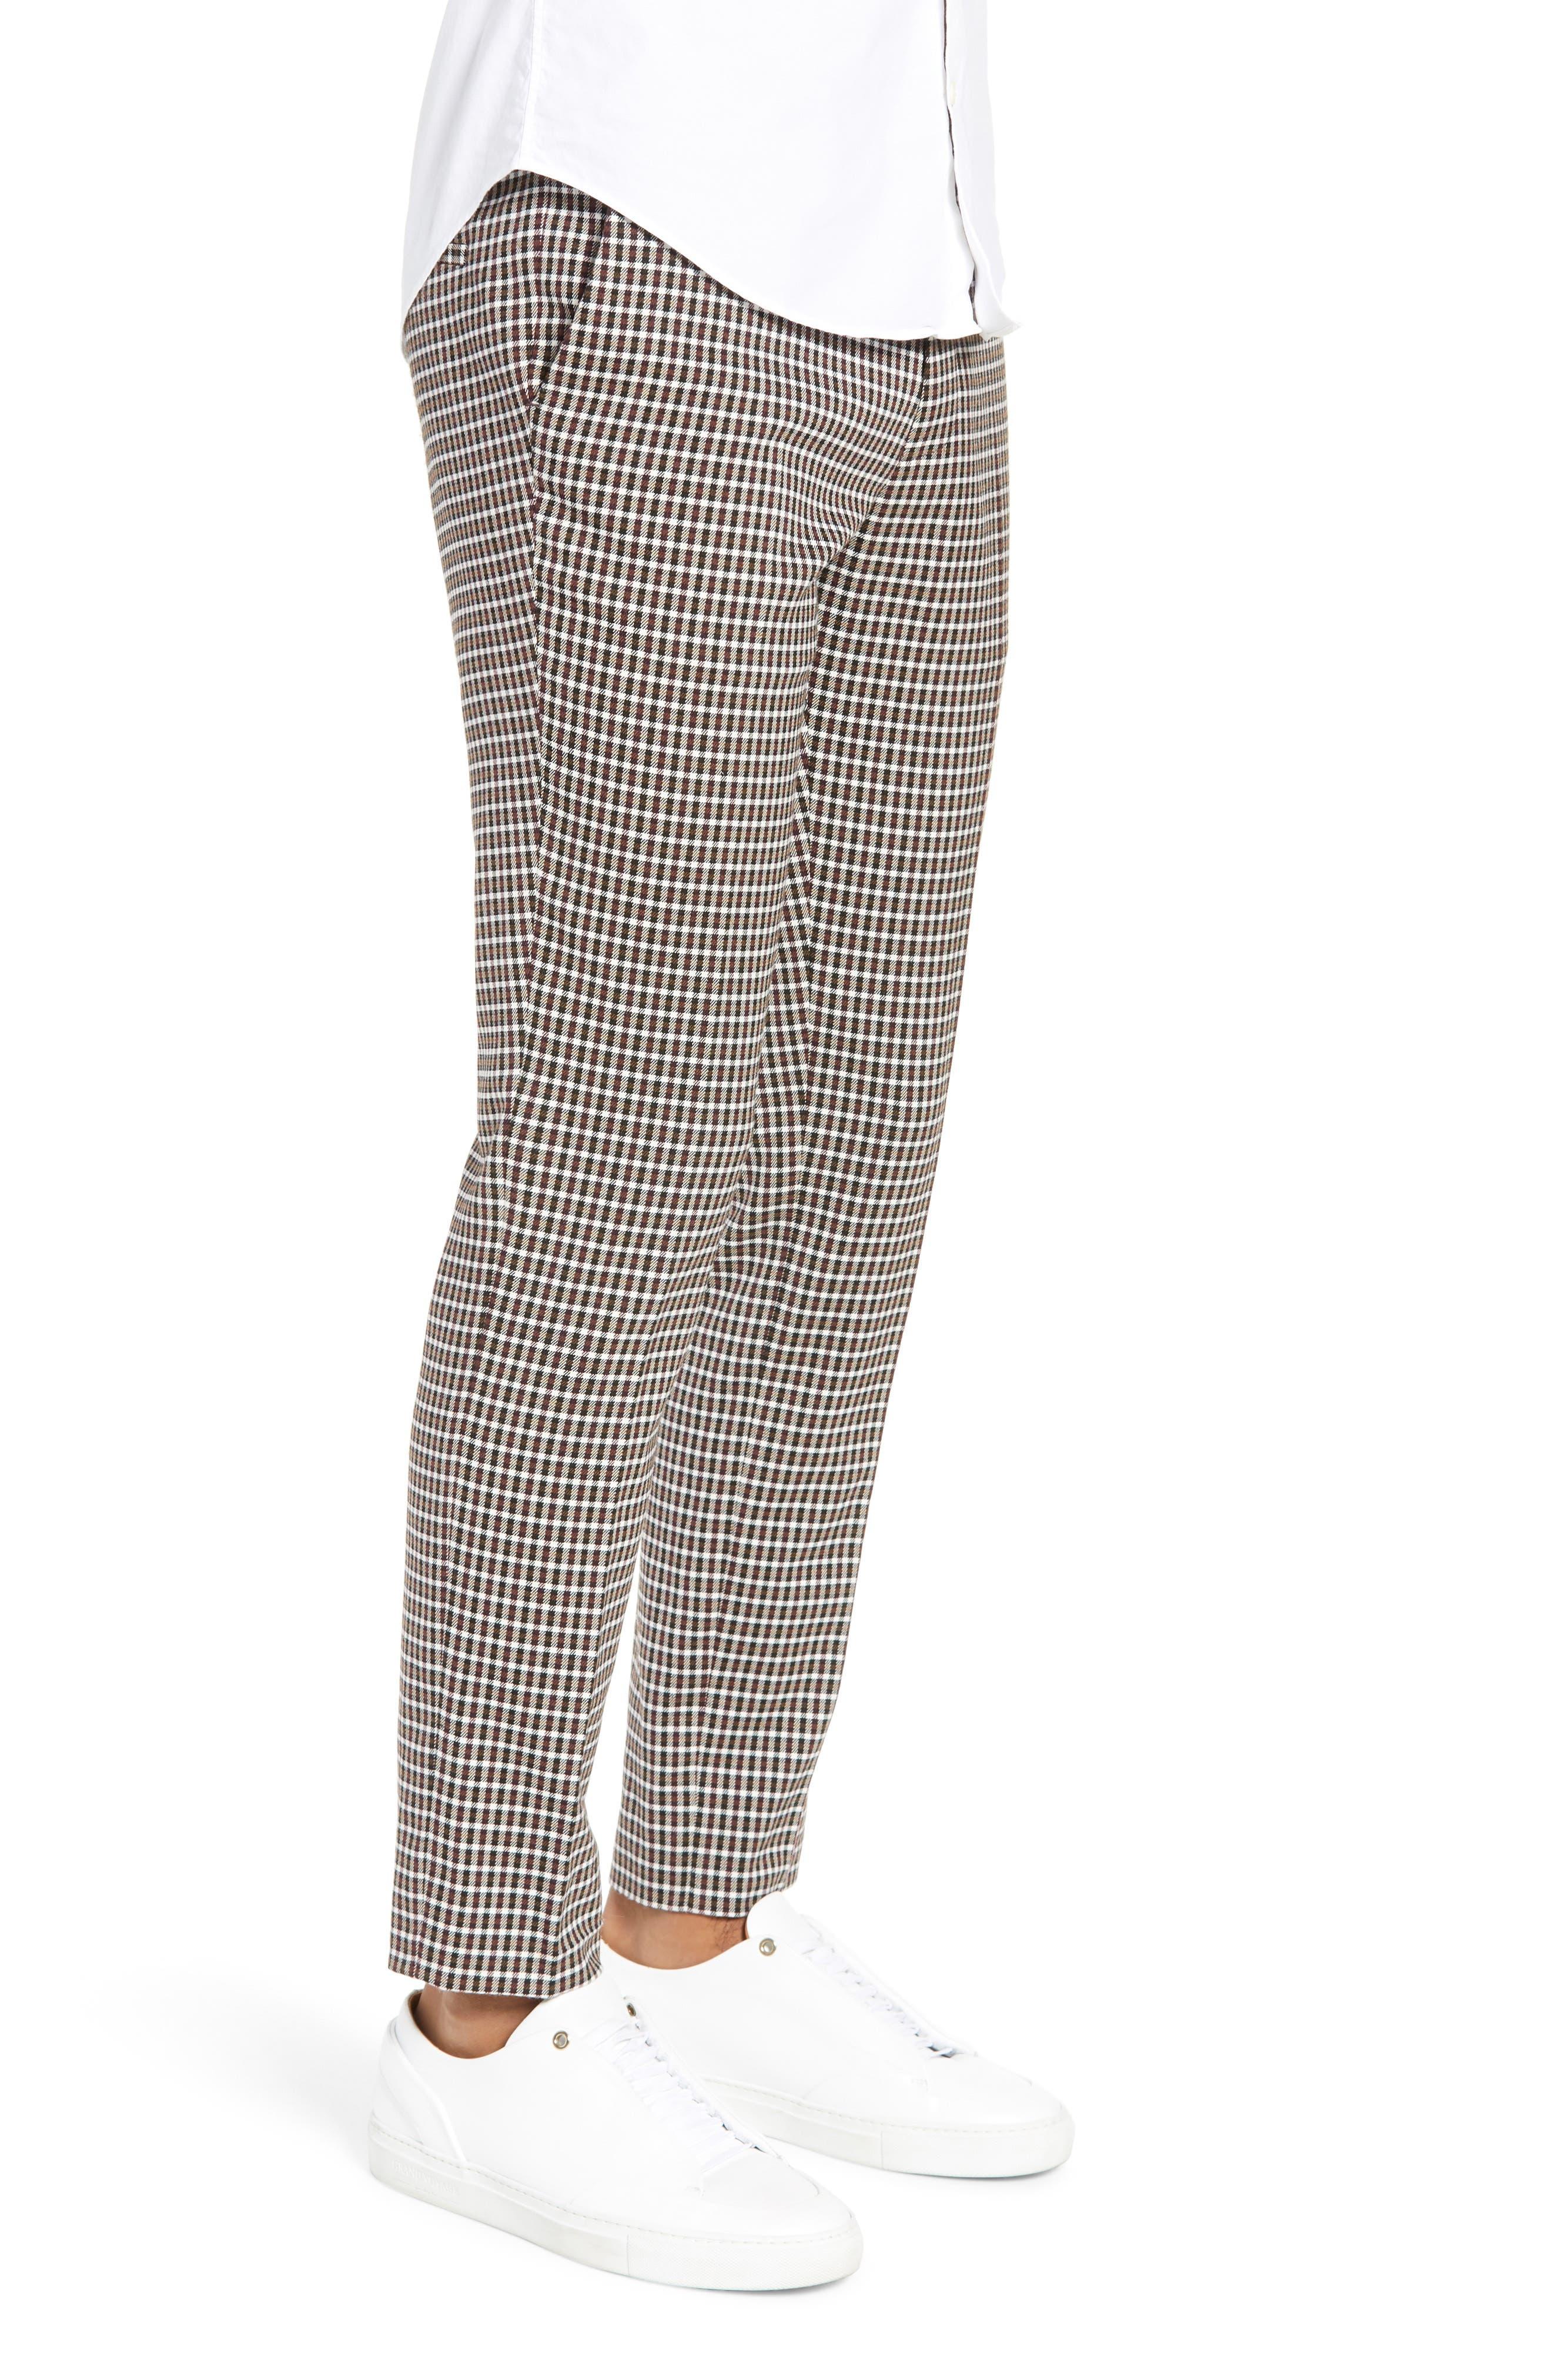 TOPMAN, Multicheck Skinny Fit Trousers, Alternate thumbnail 3, color, BLACK MULTI